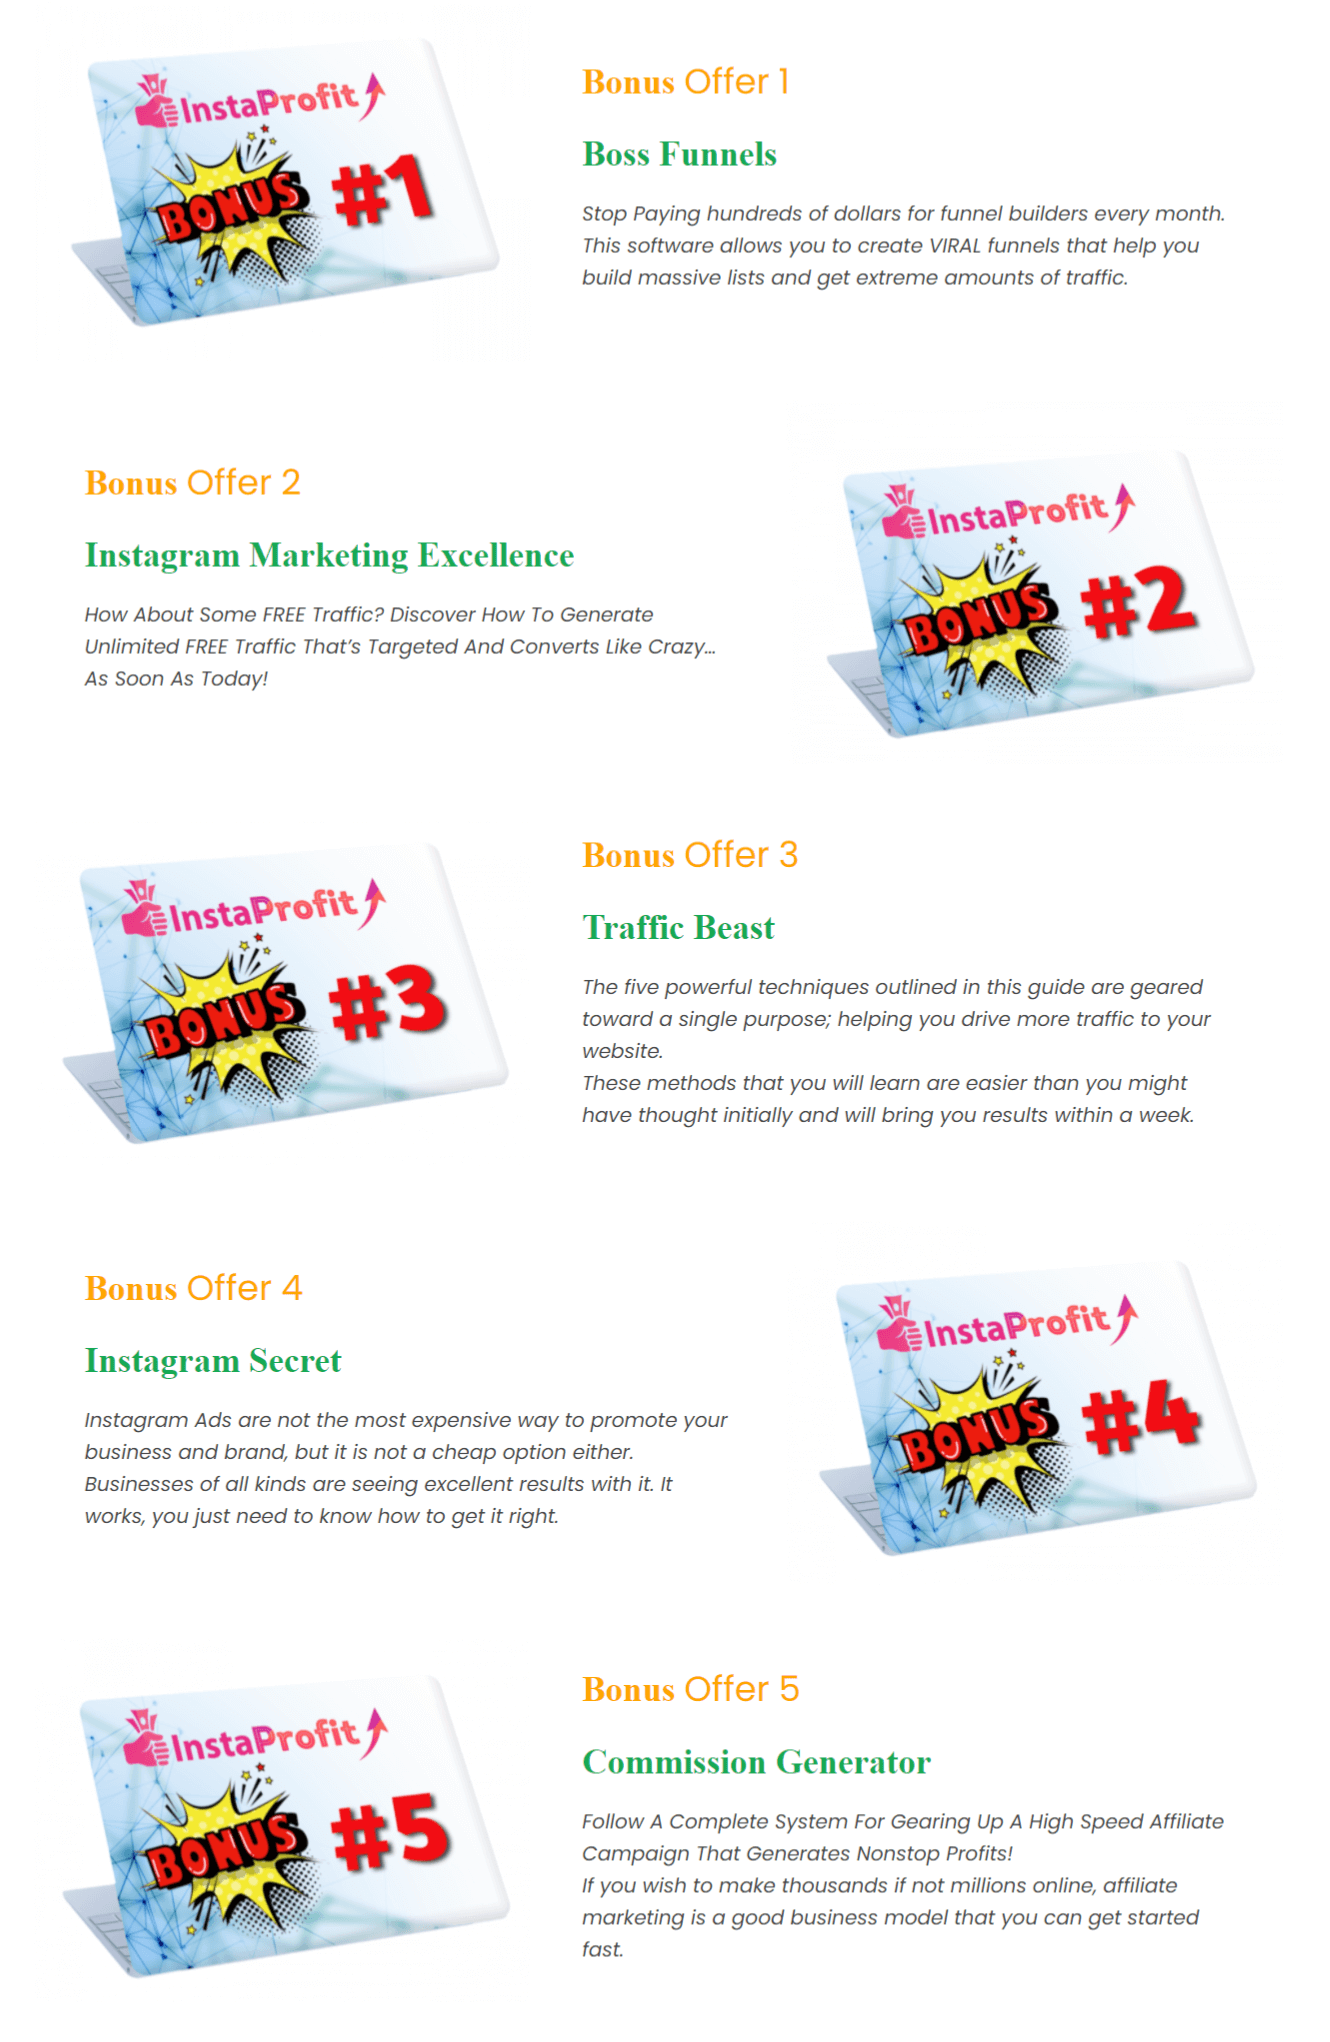 InstaProfit-Bonuses-From-Creator